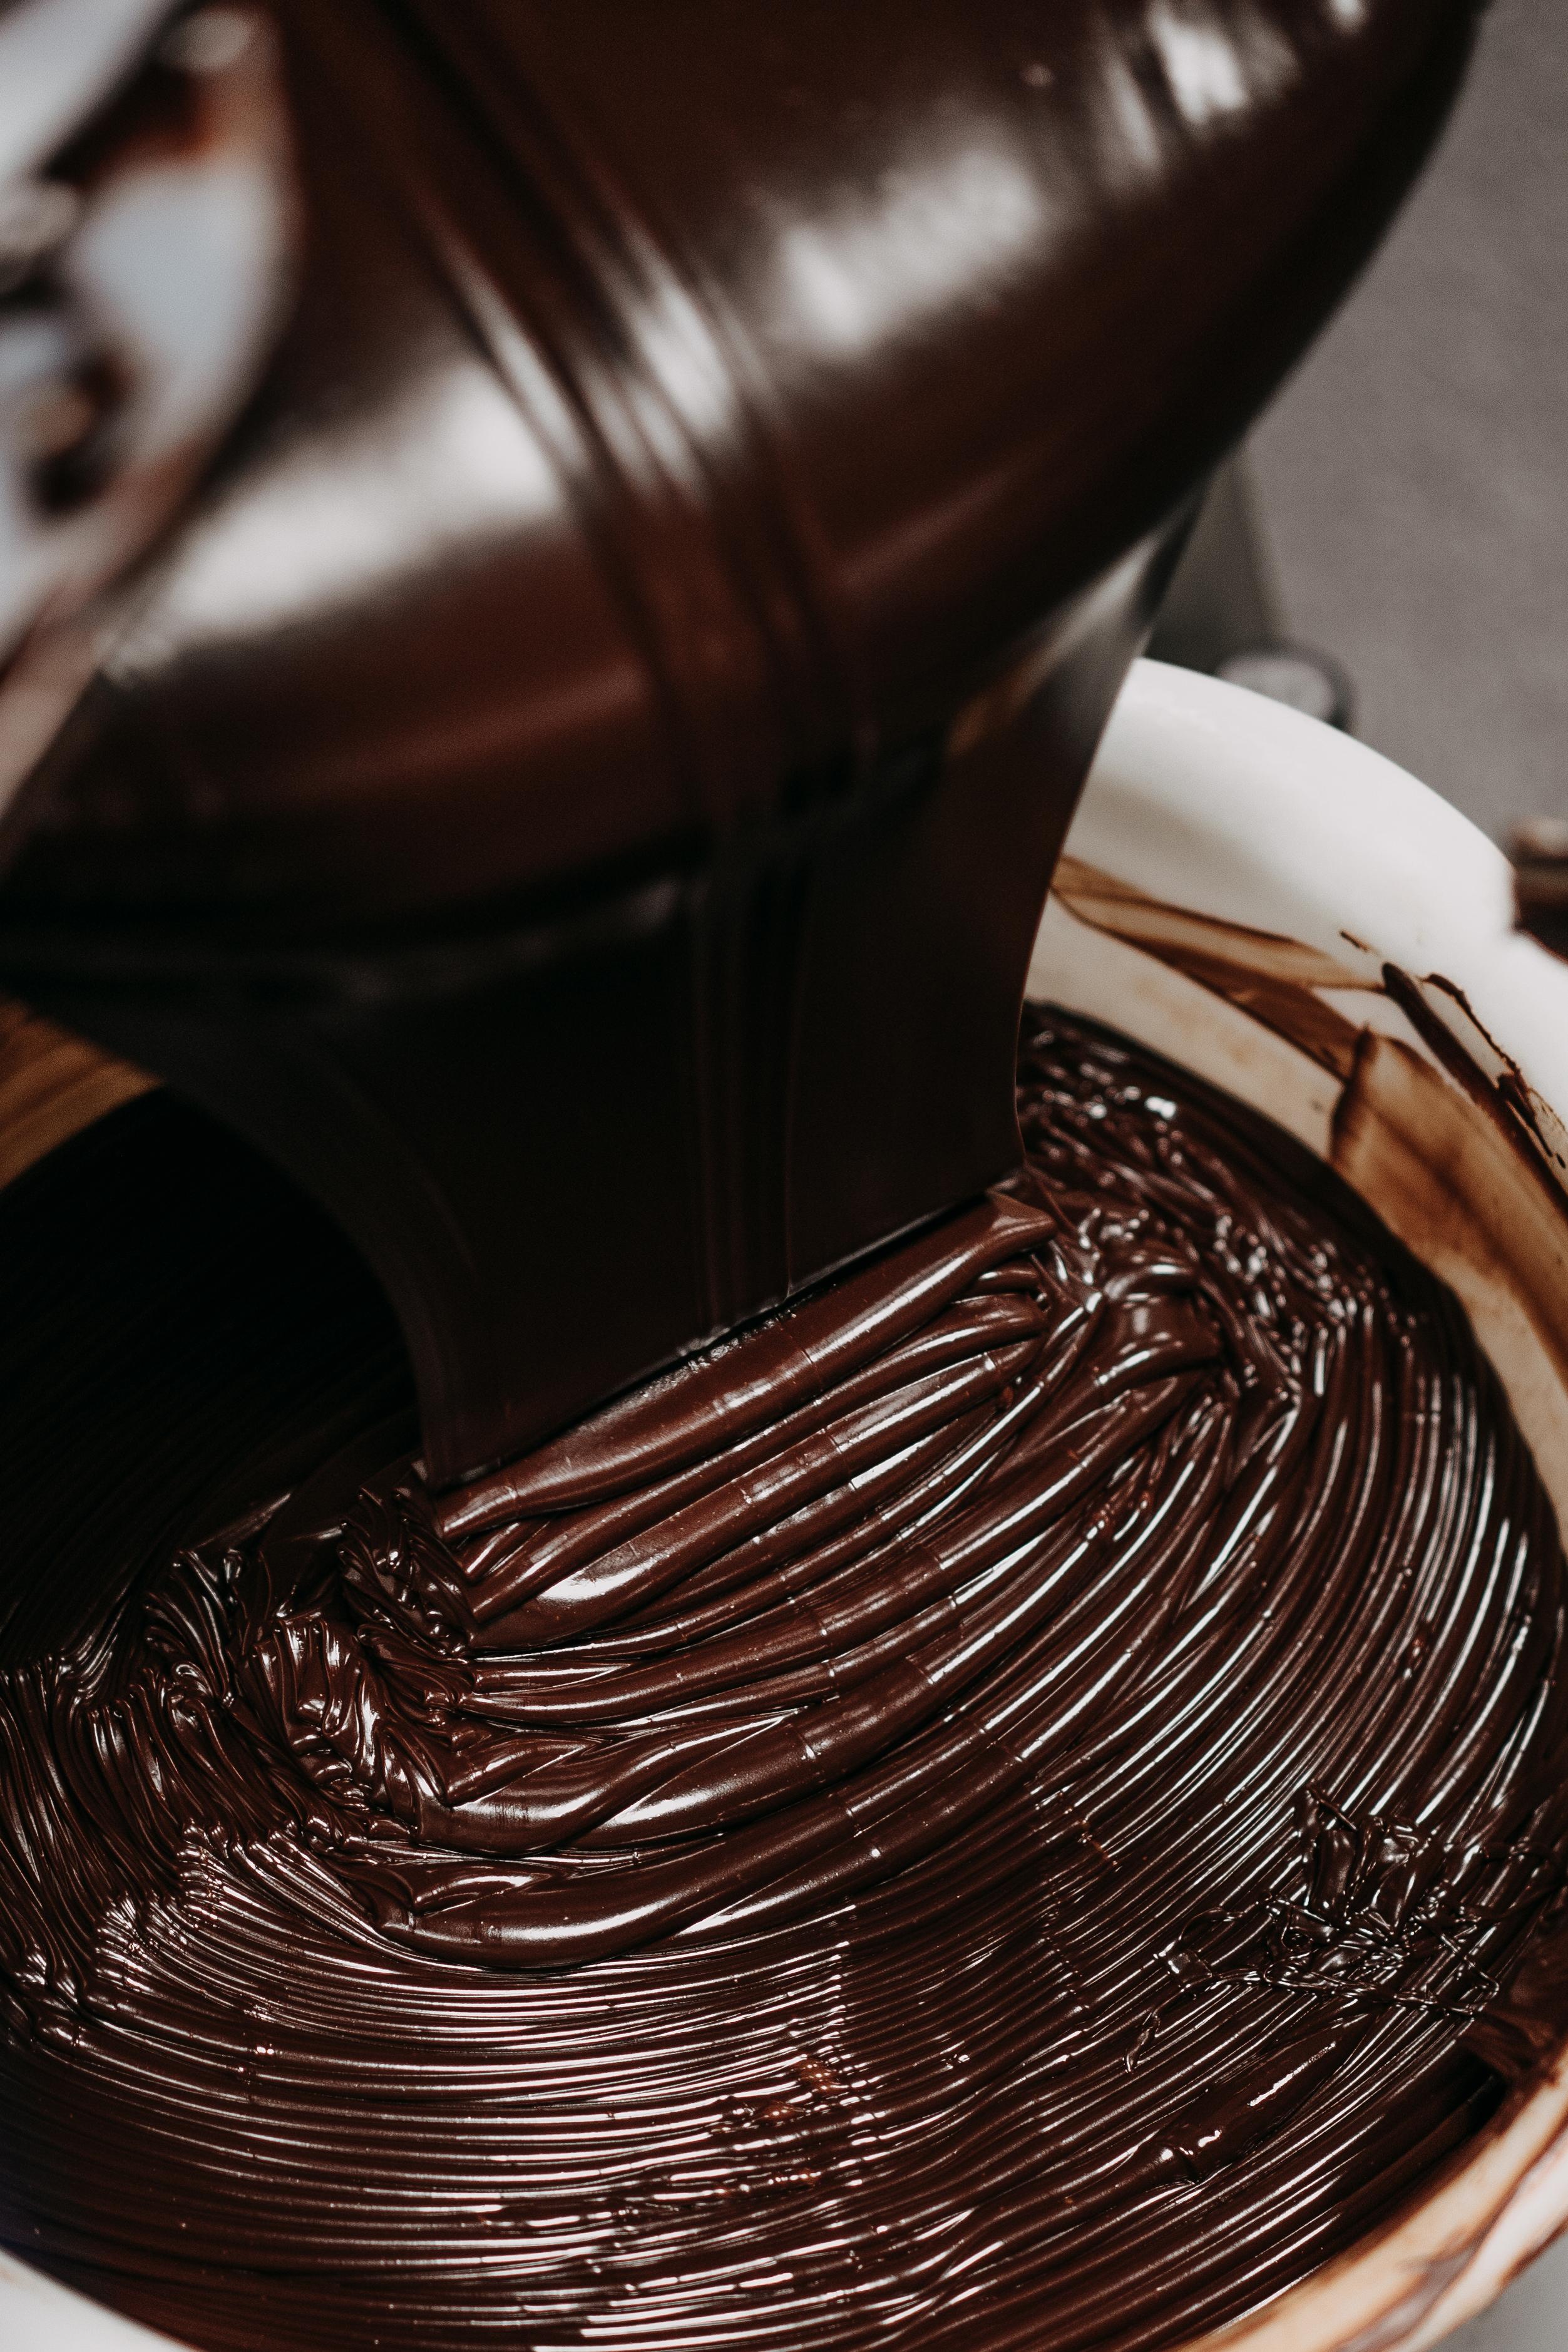 20201022 - PREVIEW Van Dender Chocolates